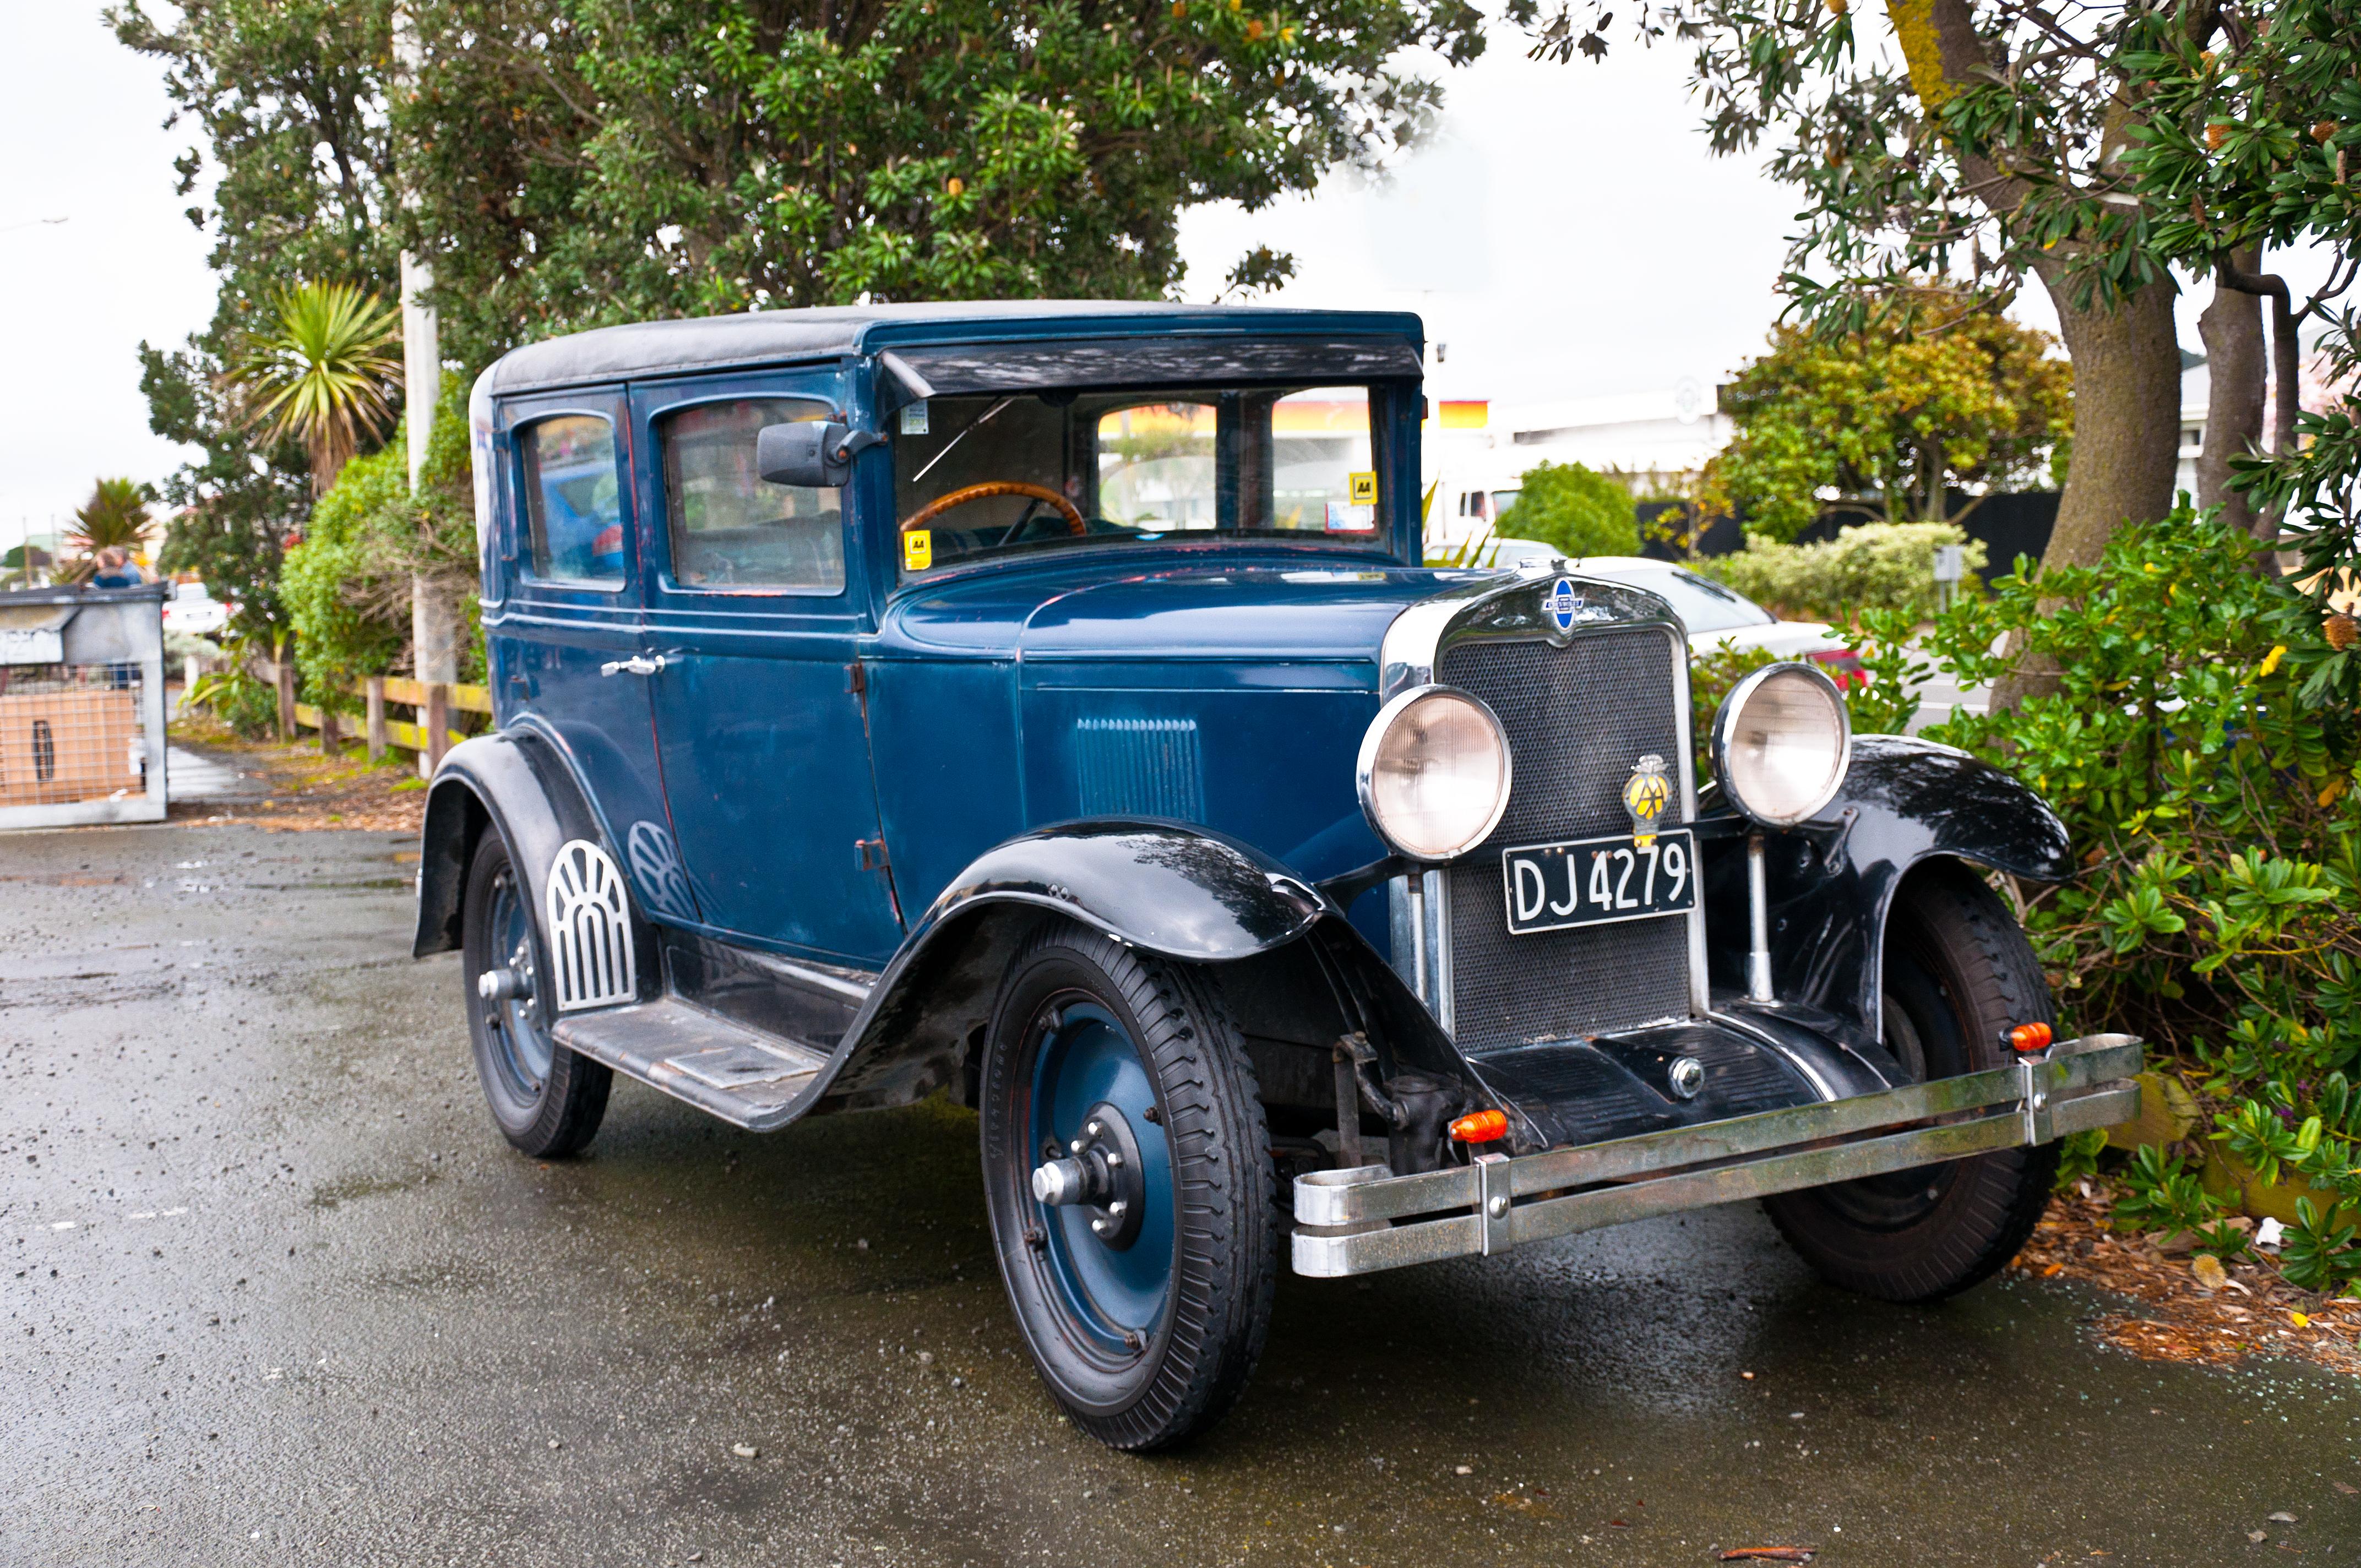 1929 CHEVROLET 29, Car, Chevrolet, New Brighton, Truck, HQ Photo